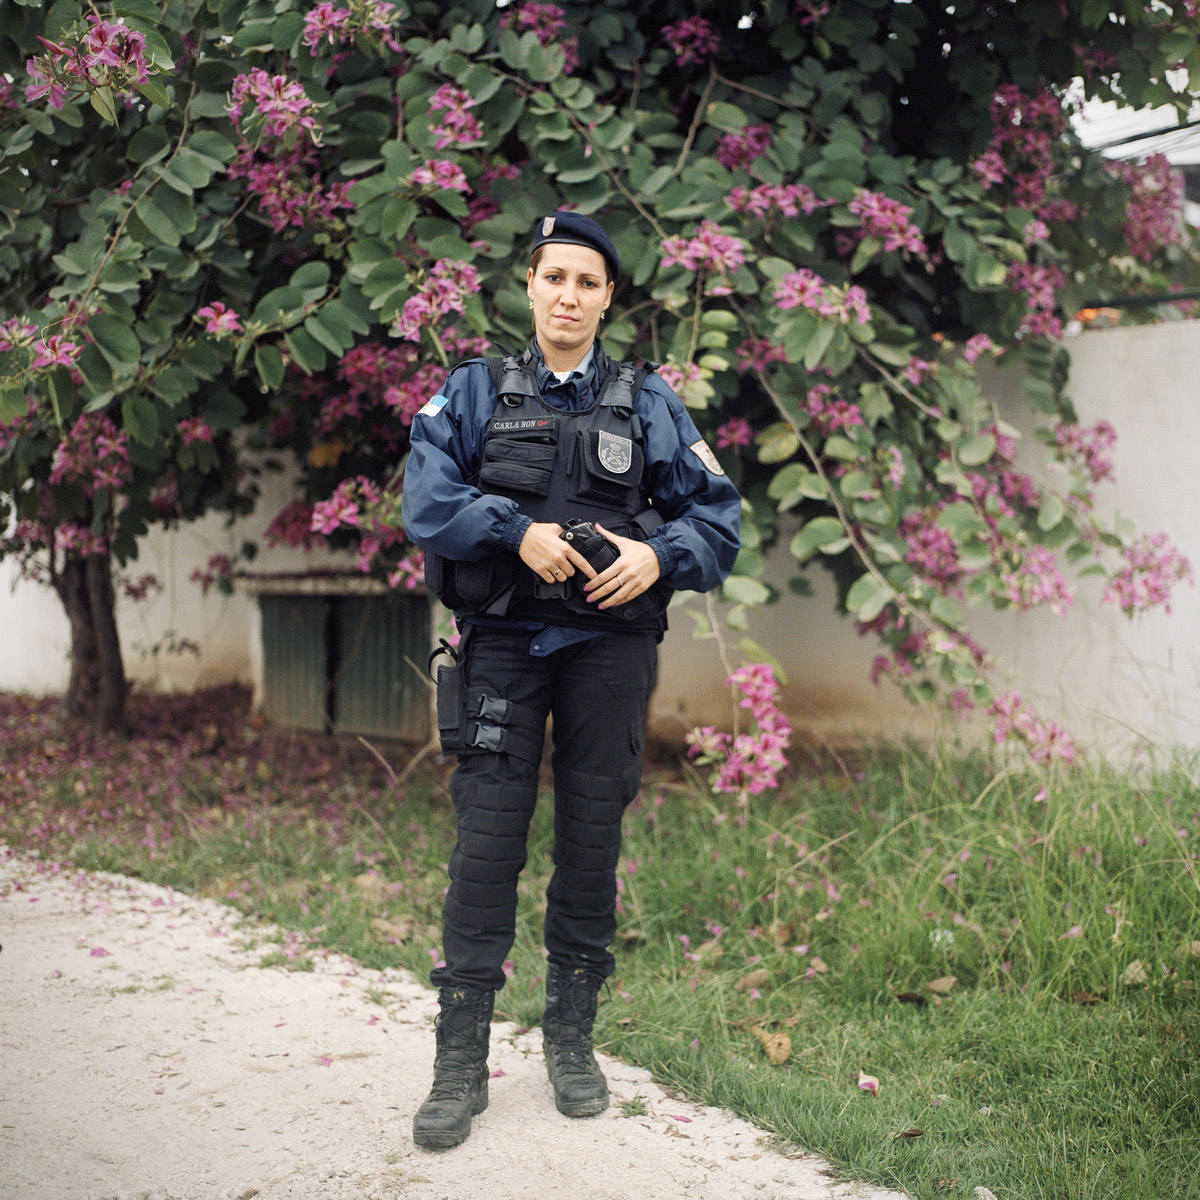 Patrol Officer Carla Bonn, 33, with the Rapid Response Team of the Pacifying Police Unit (UPP), in Complexo do Caju, Rio de Janeiro, Brazil.